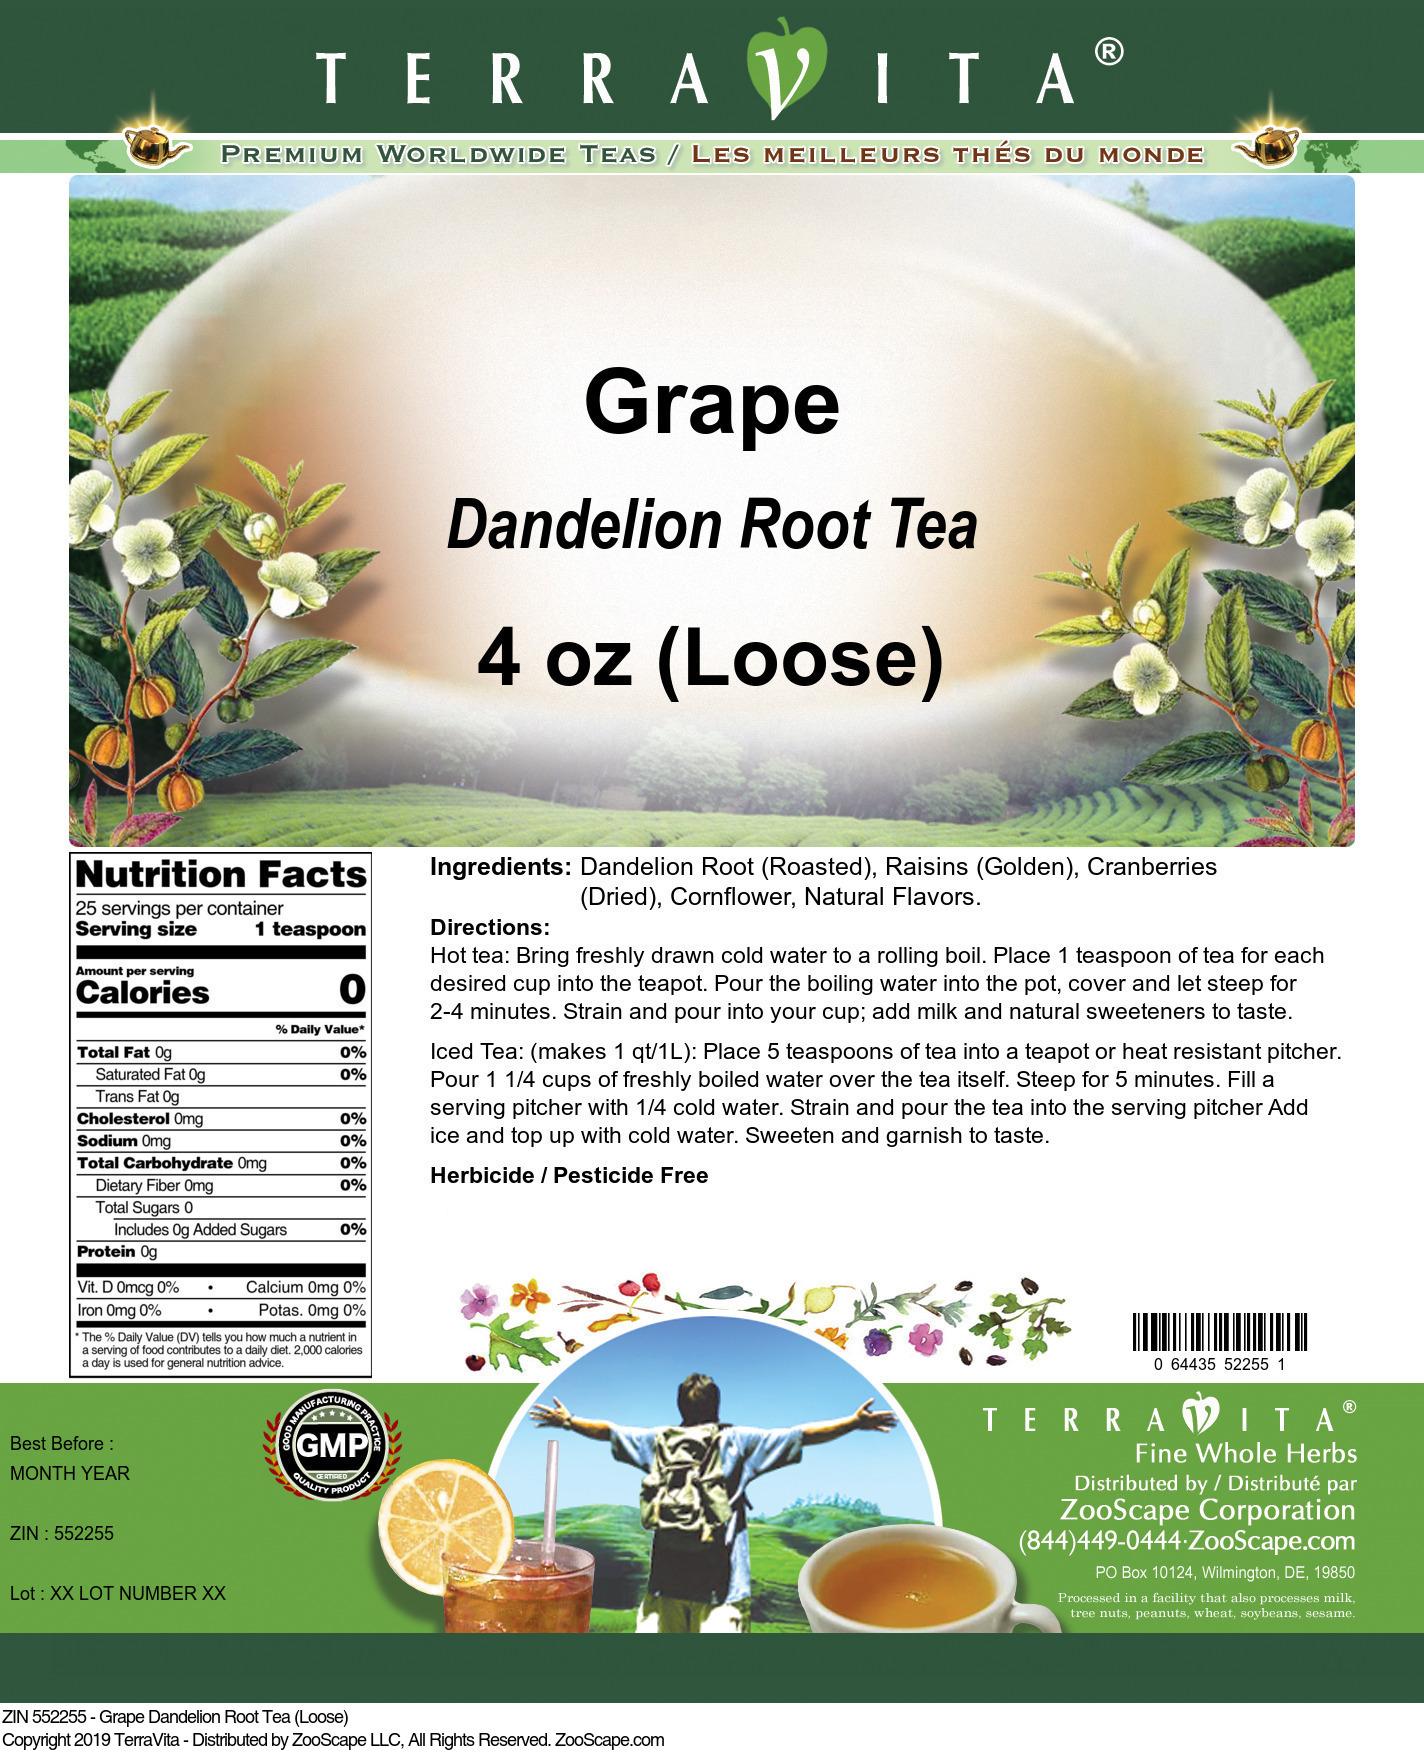 Grape Dandelion Root